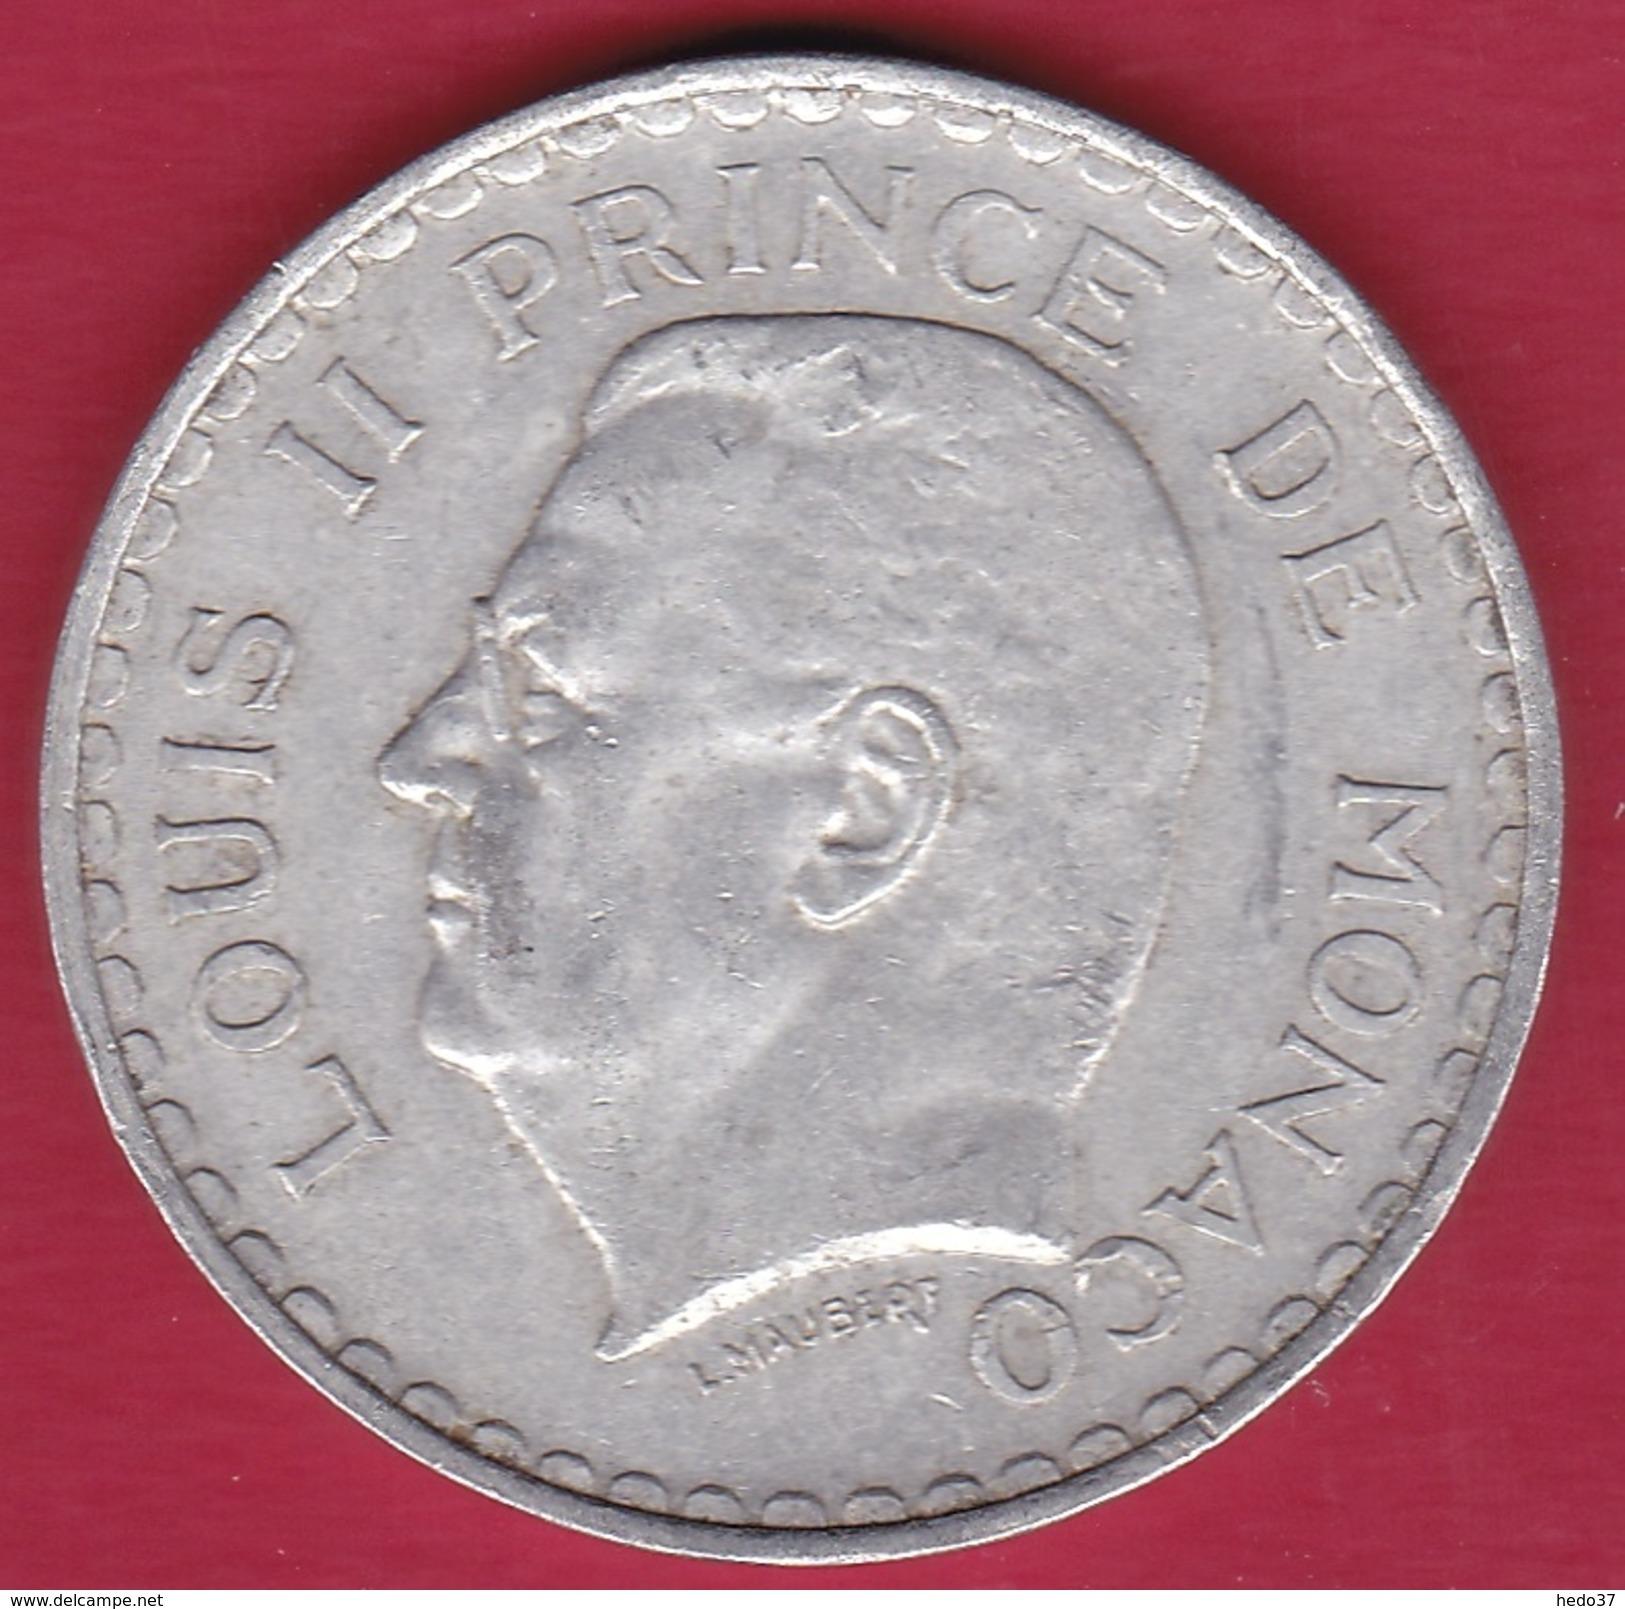 Monaco - Louis II - 5 Francs Aluminium (1943) - Monaco